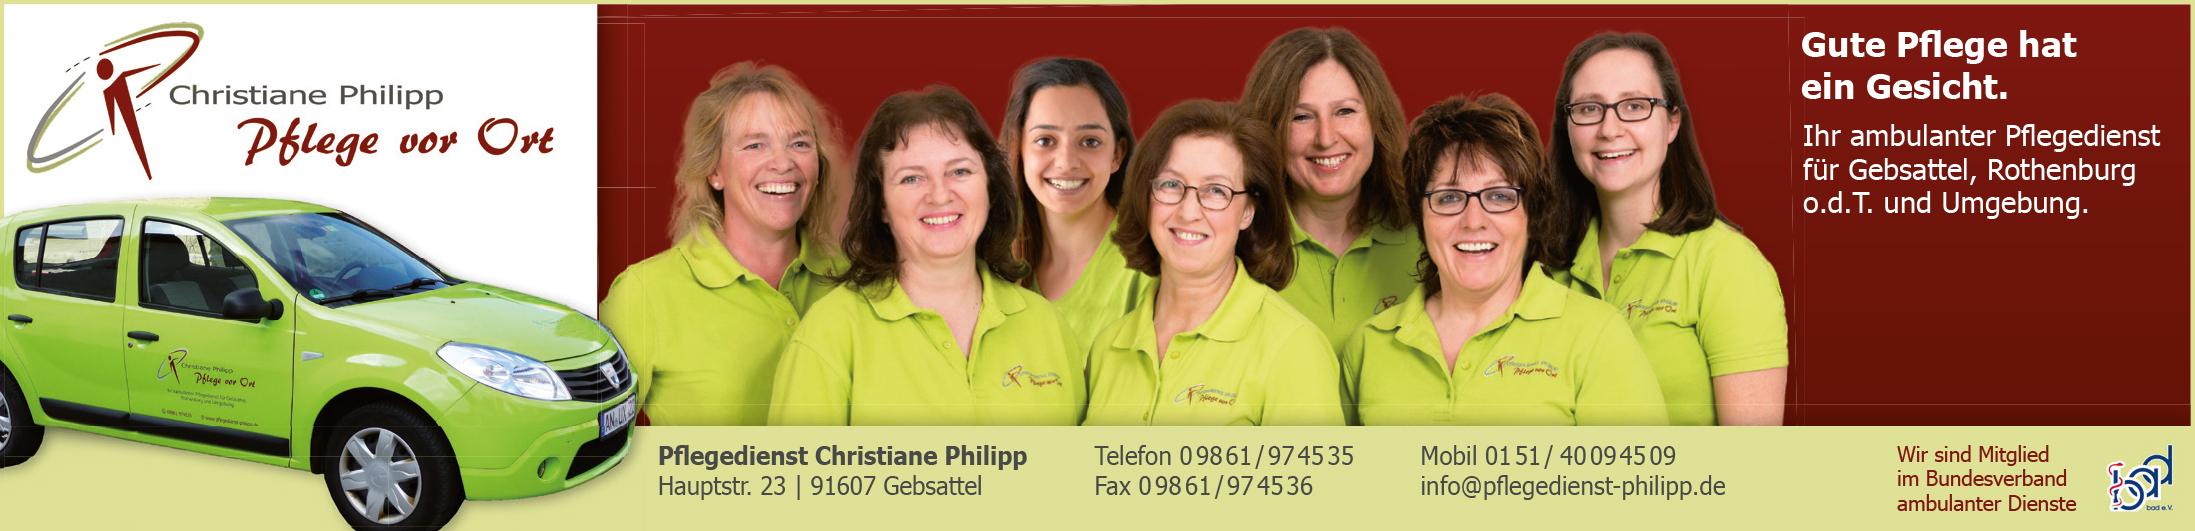 Team Pflegedienst Mai 2016.